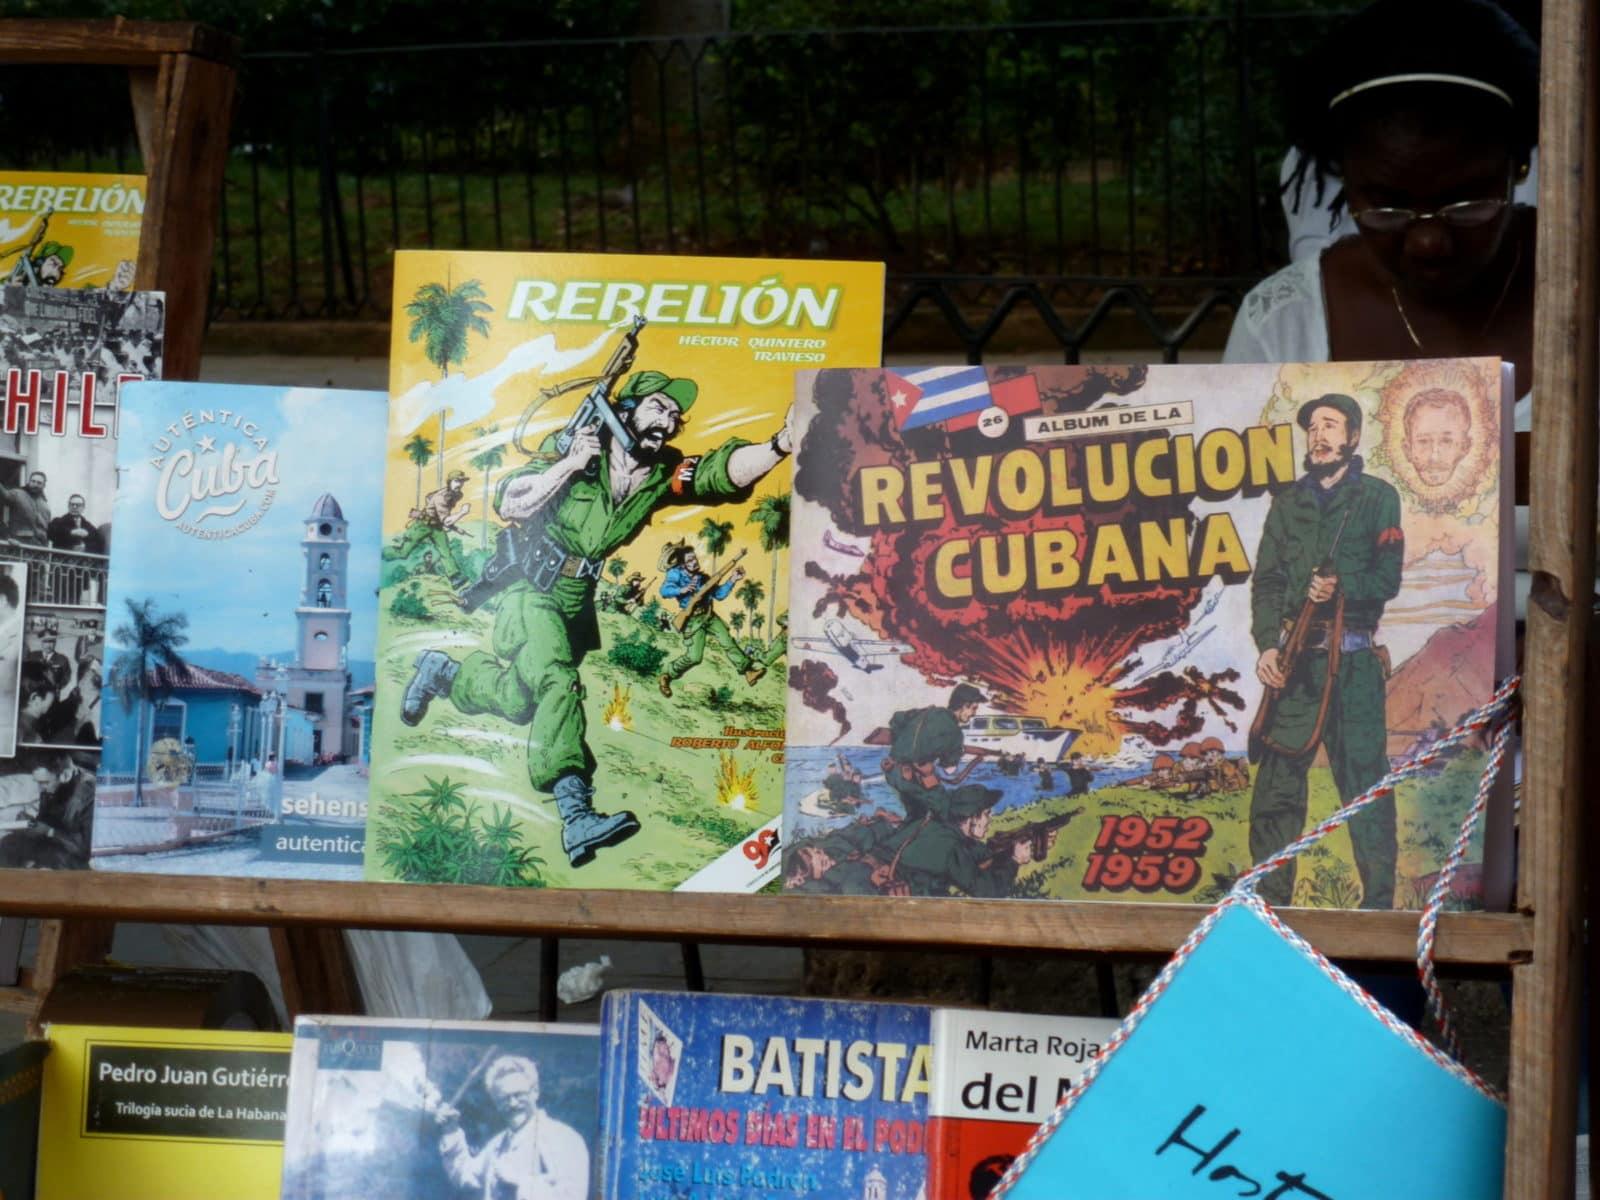 Kuba Revolution Bücher in Havanna